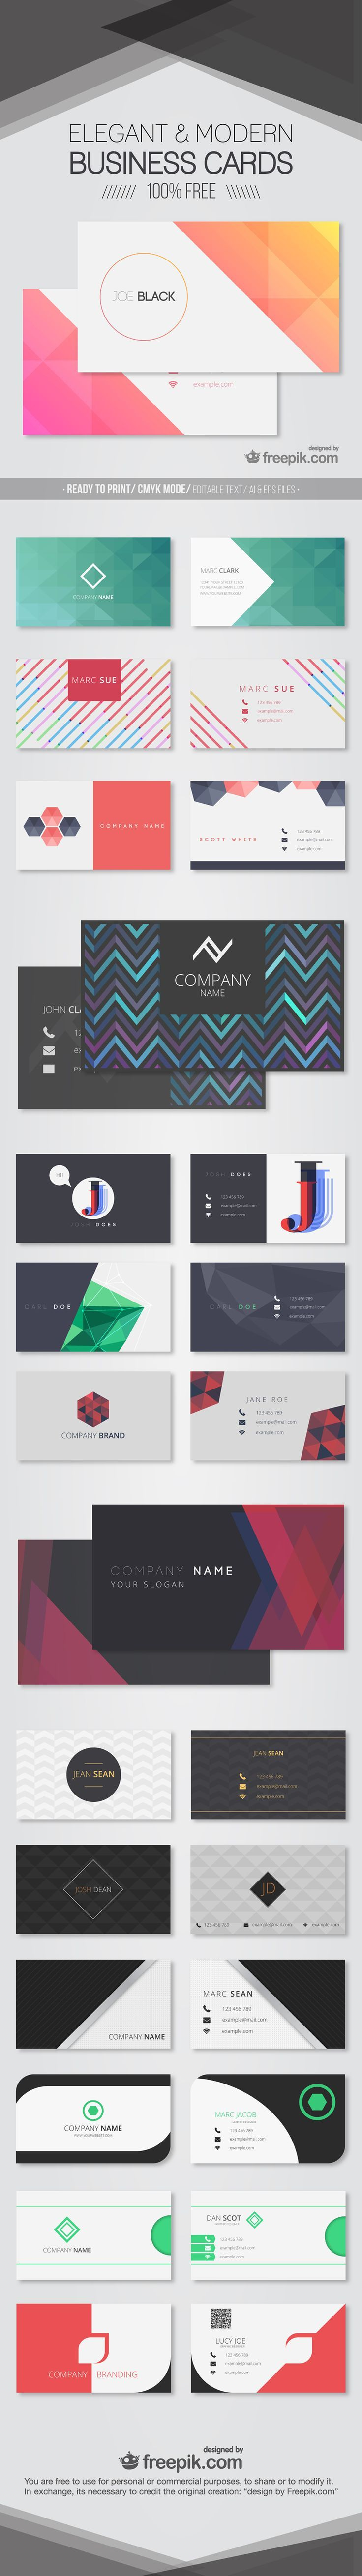 Super modern business card designs